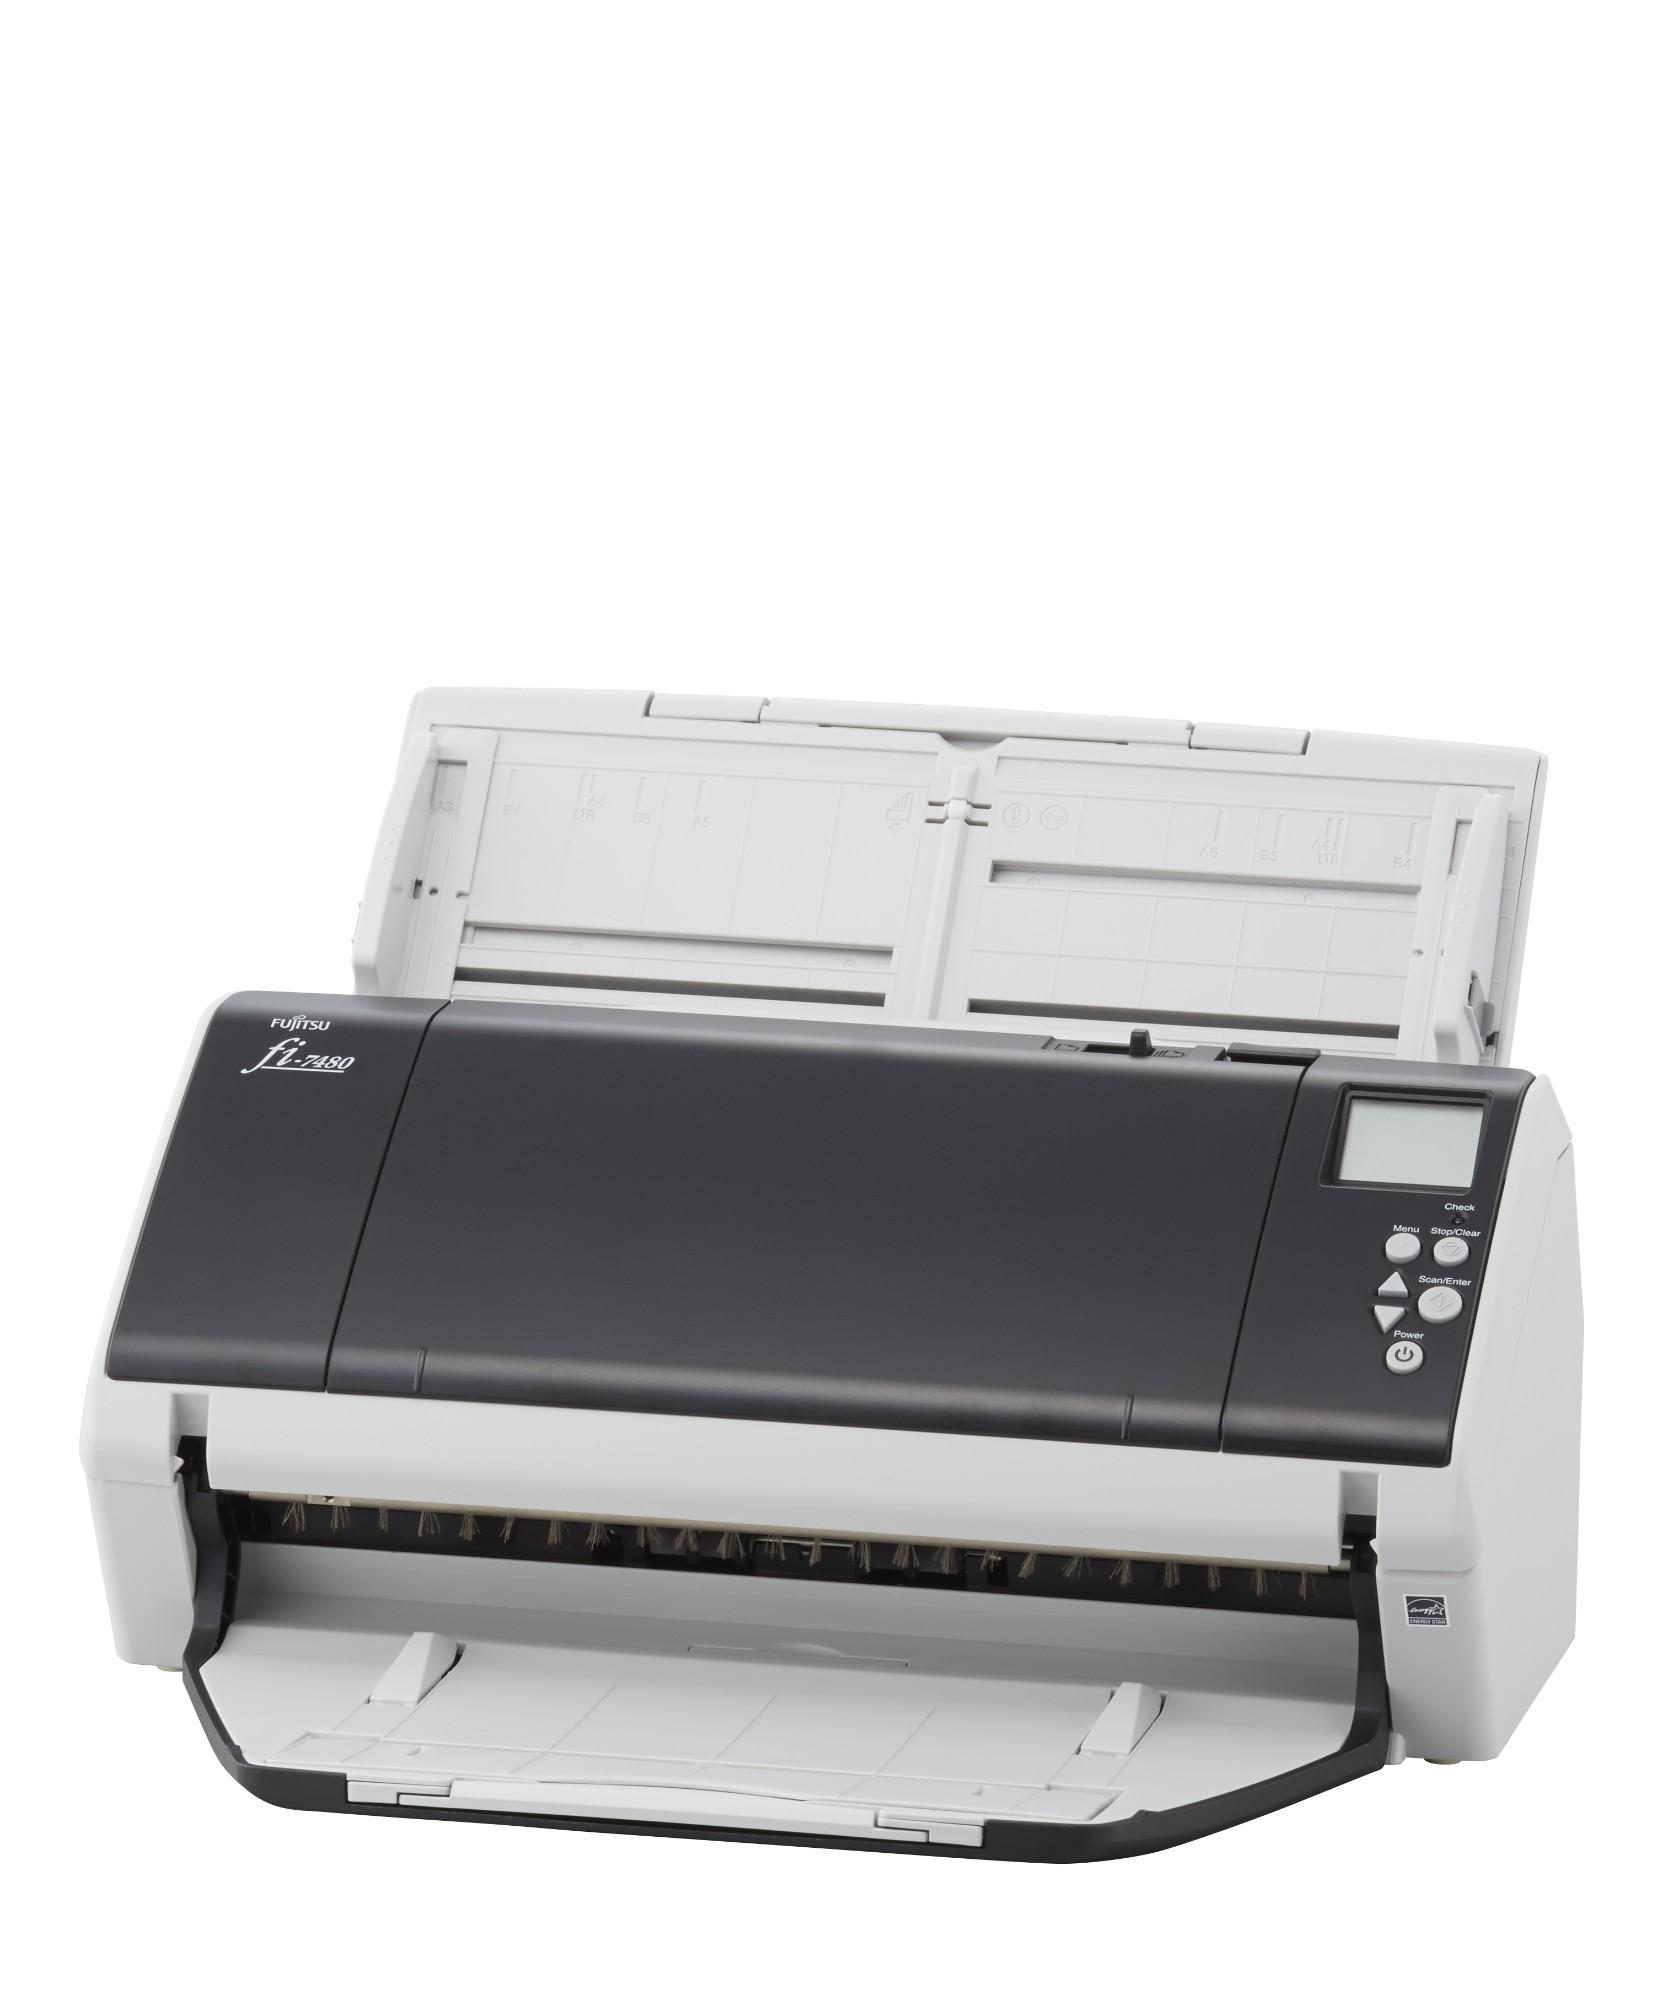 Fujitsu fi-7480 ADF scanner 600 x 600 DPI A3 Grey, White